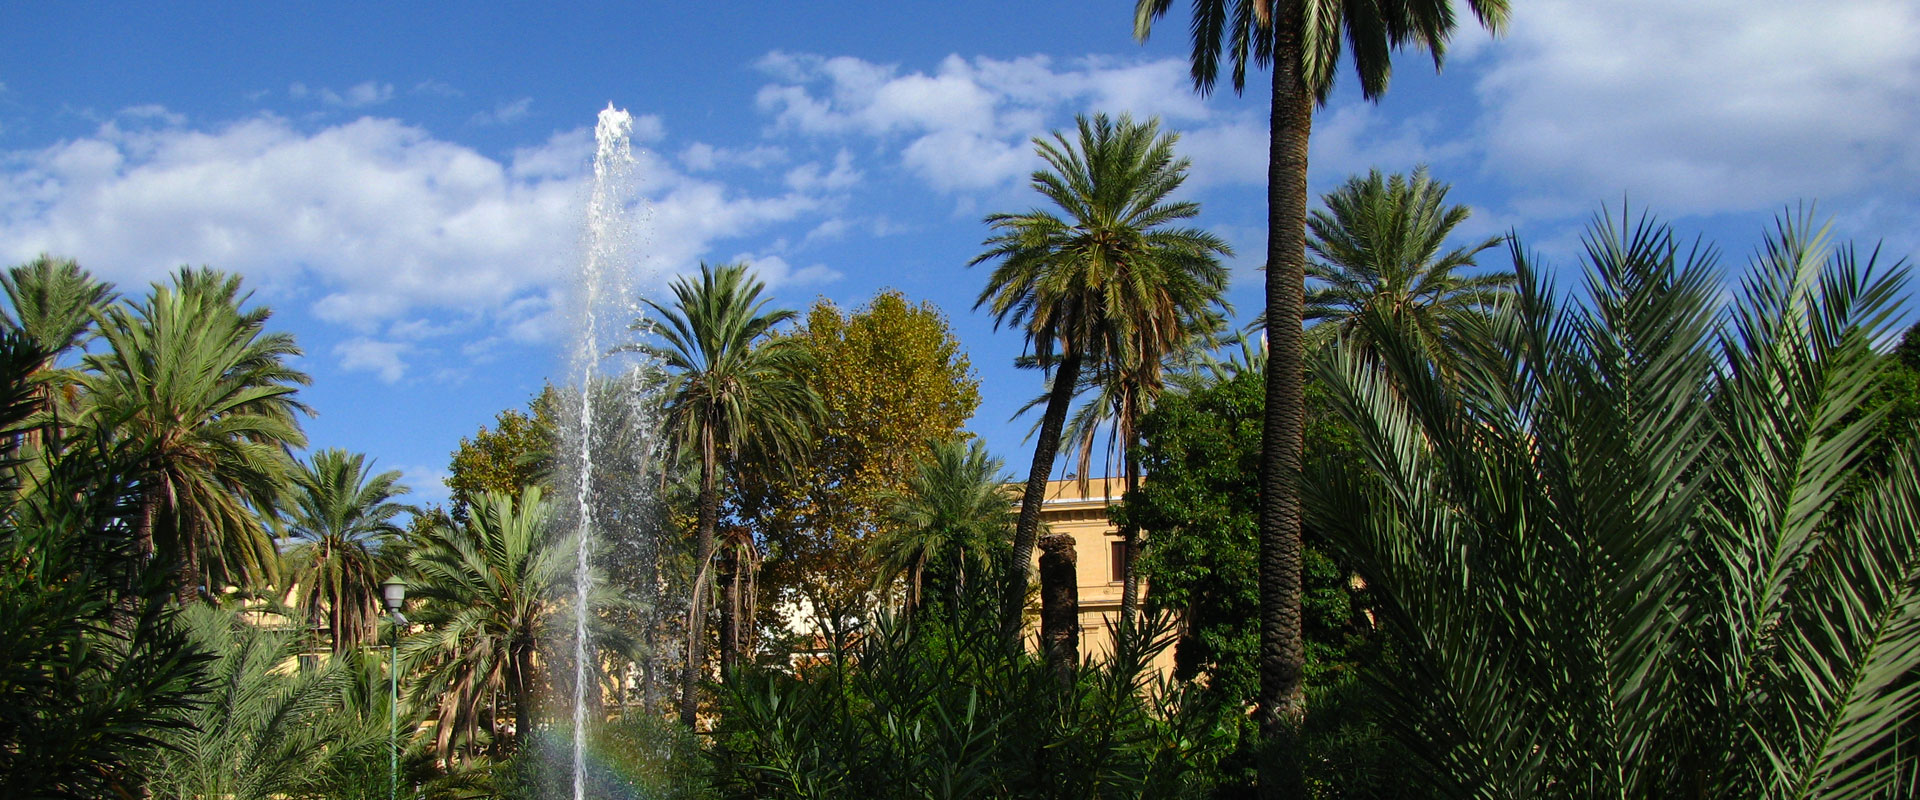 Palermo Punica